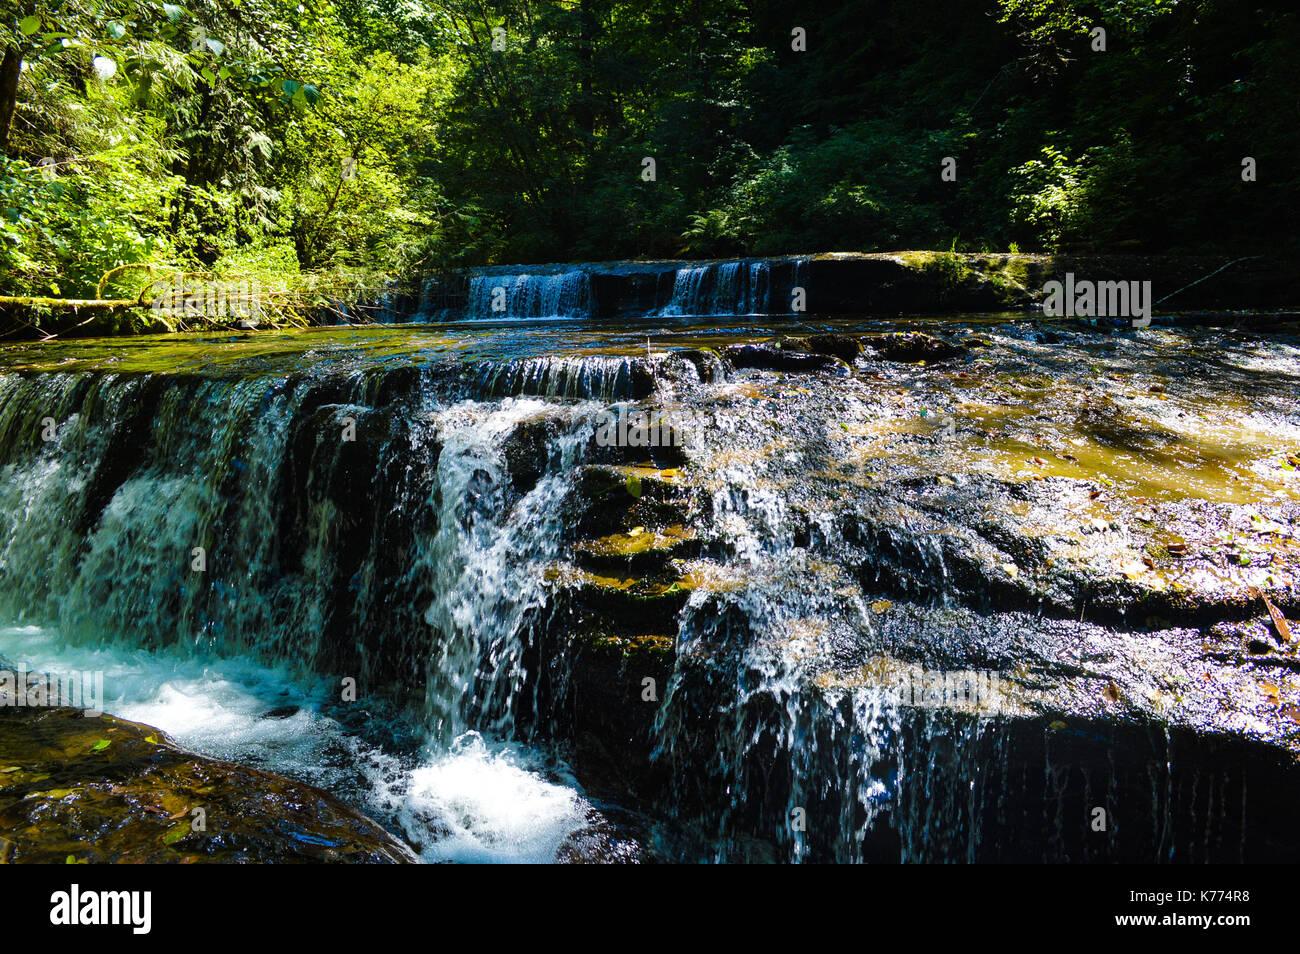 Sweet Creek Falls, OR - Stock Image